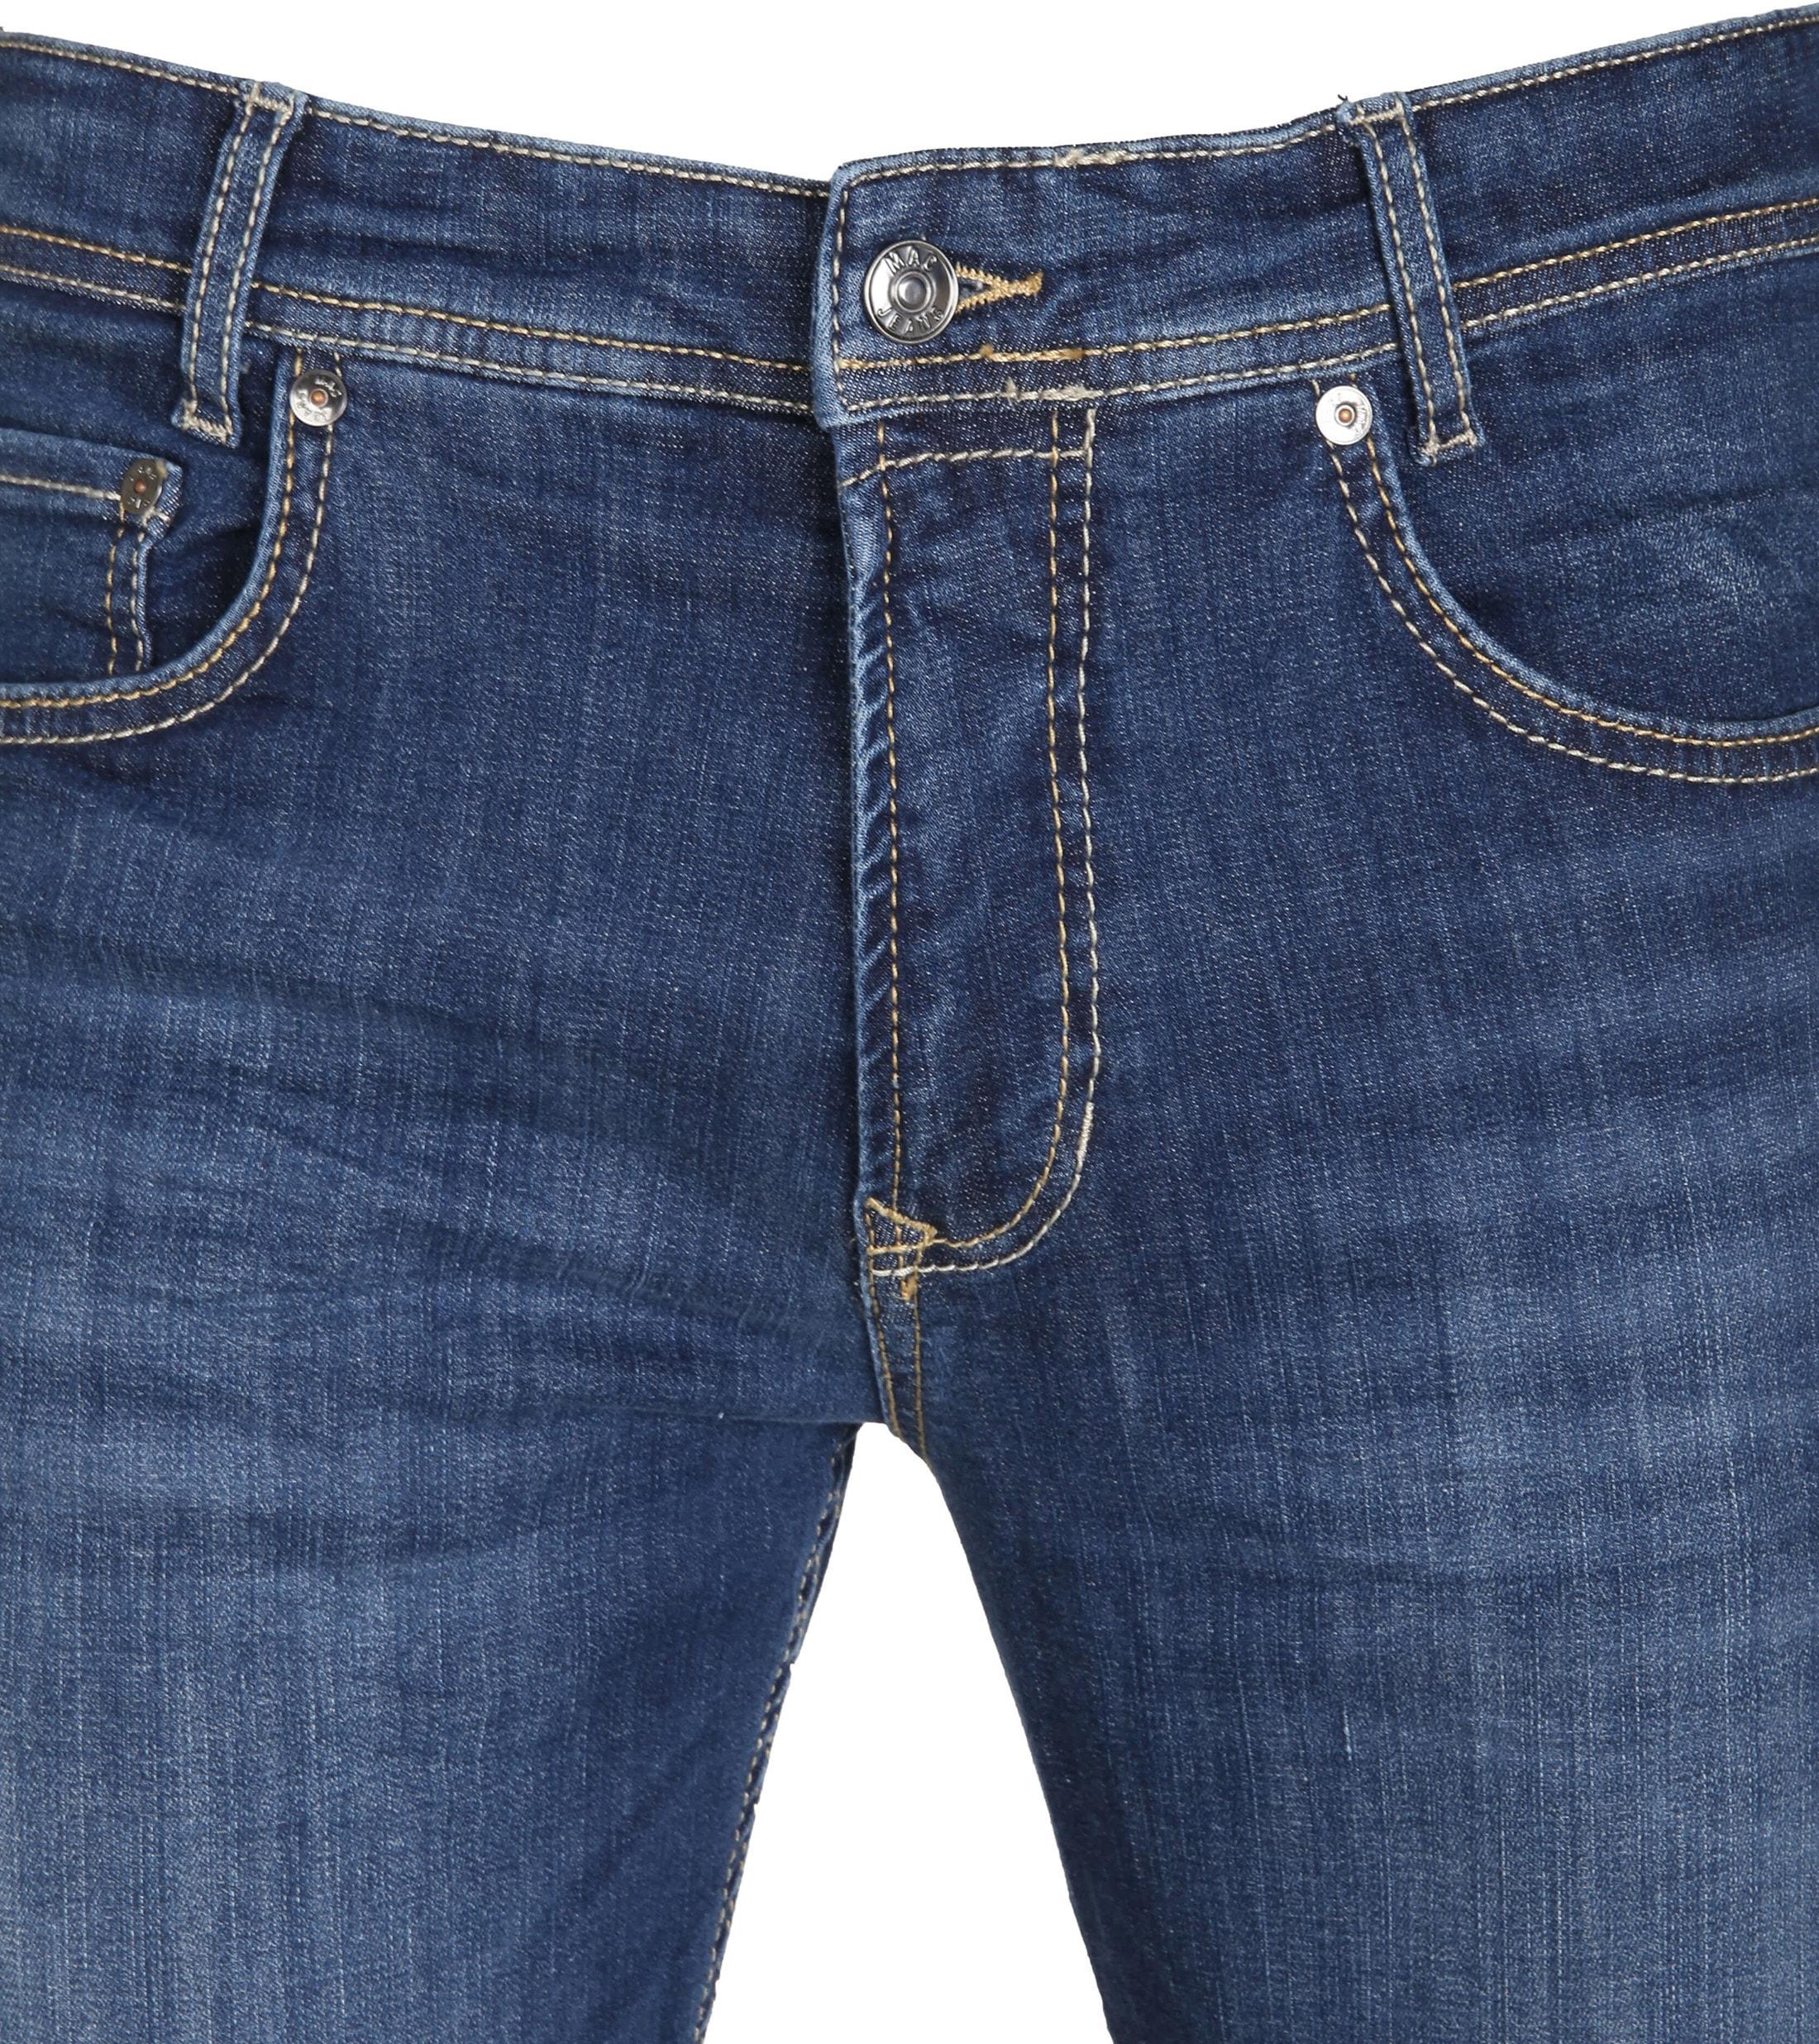 Mac Jeans Flexx H554 foto 2